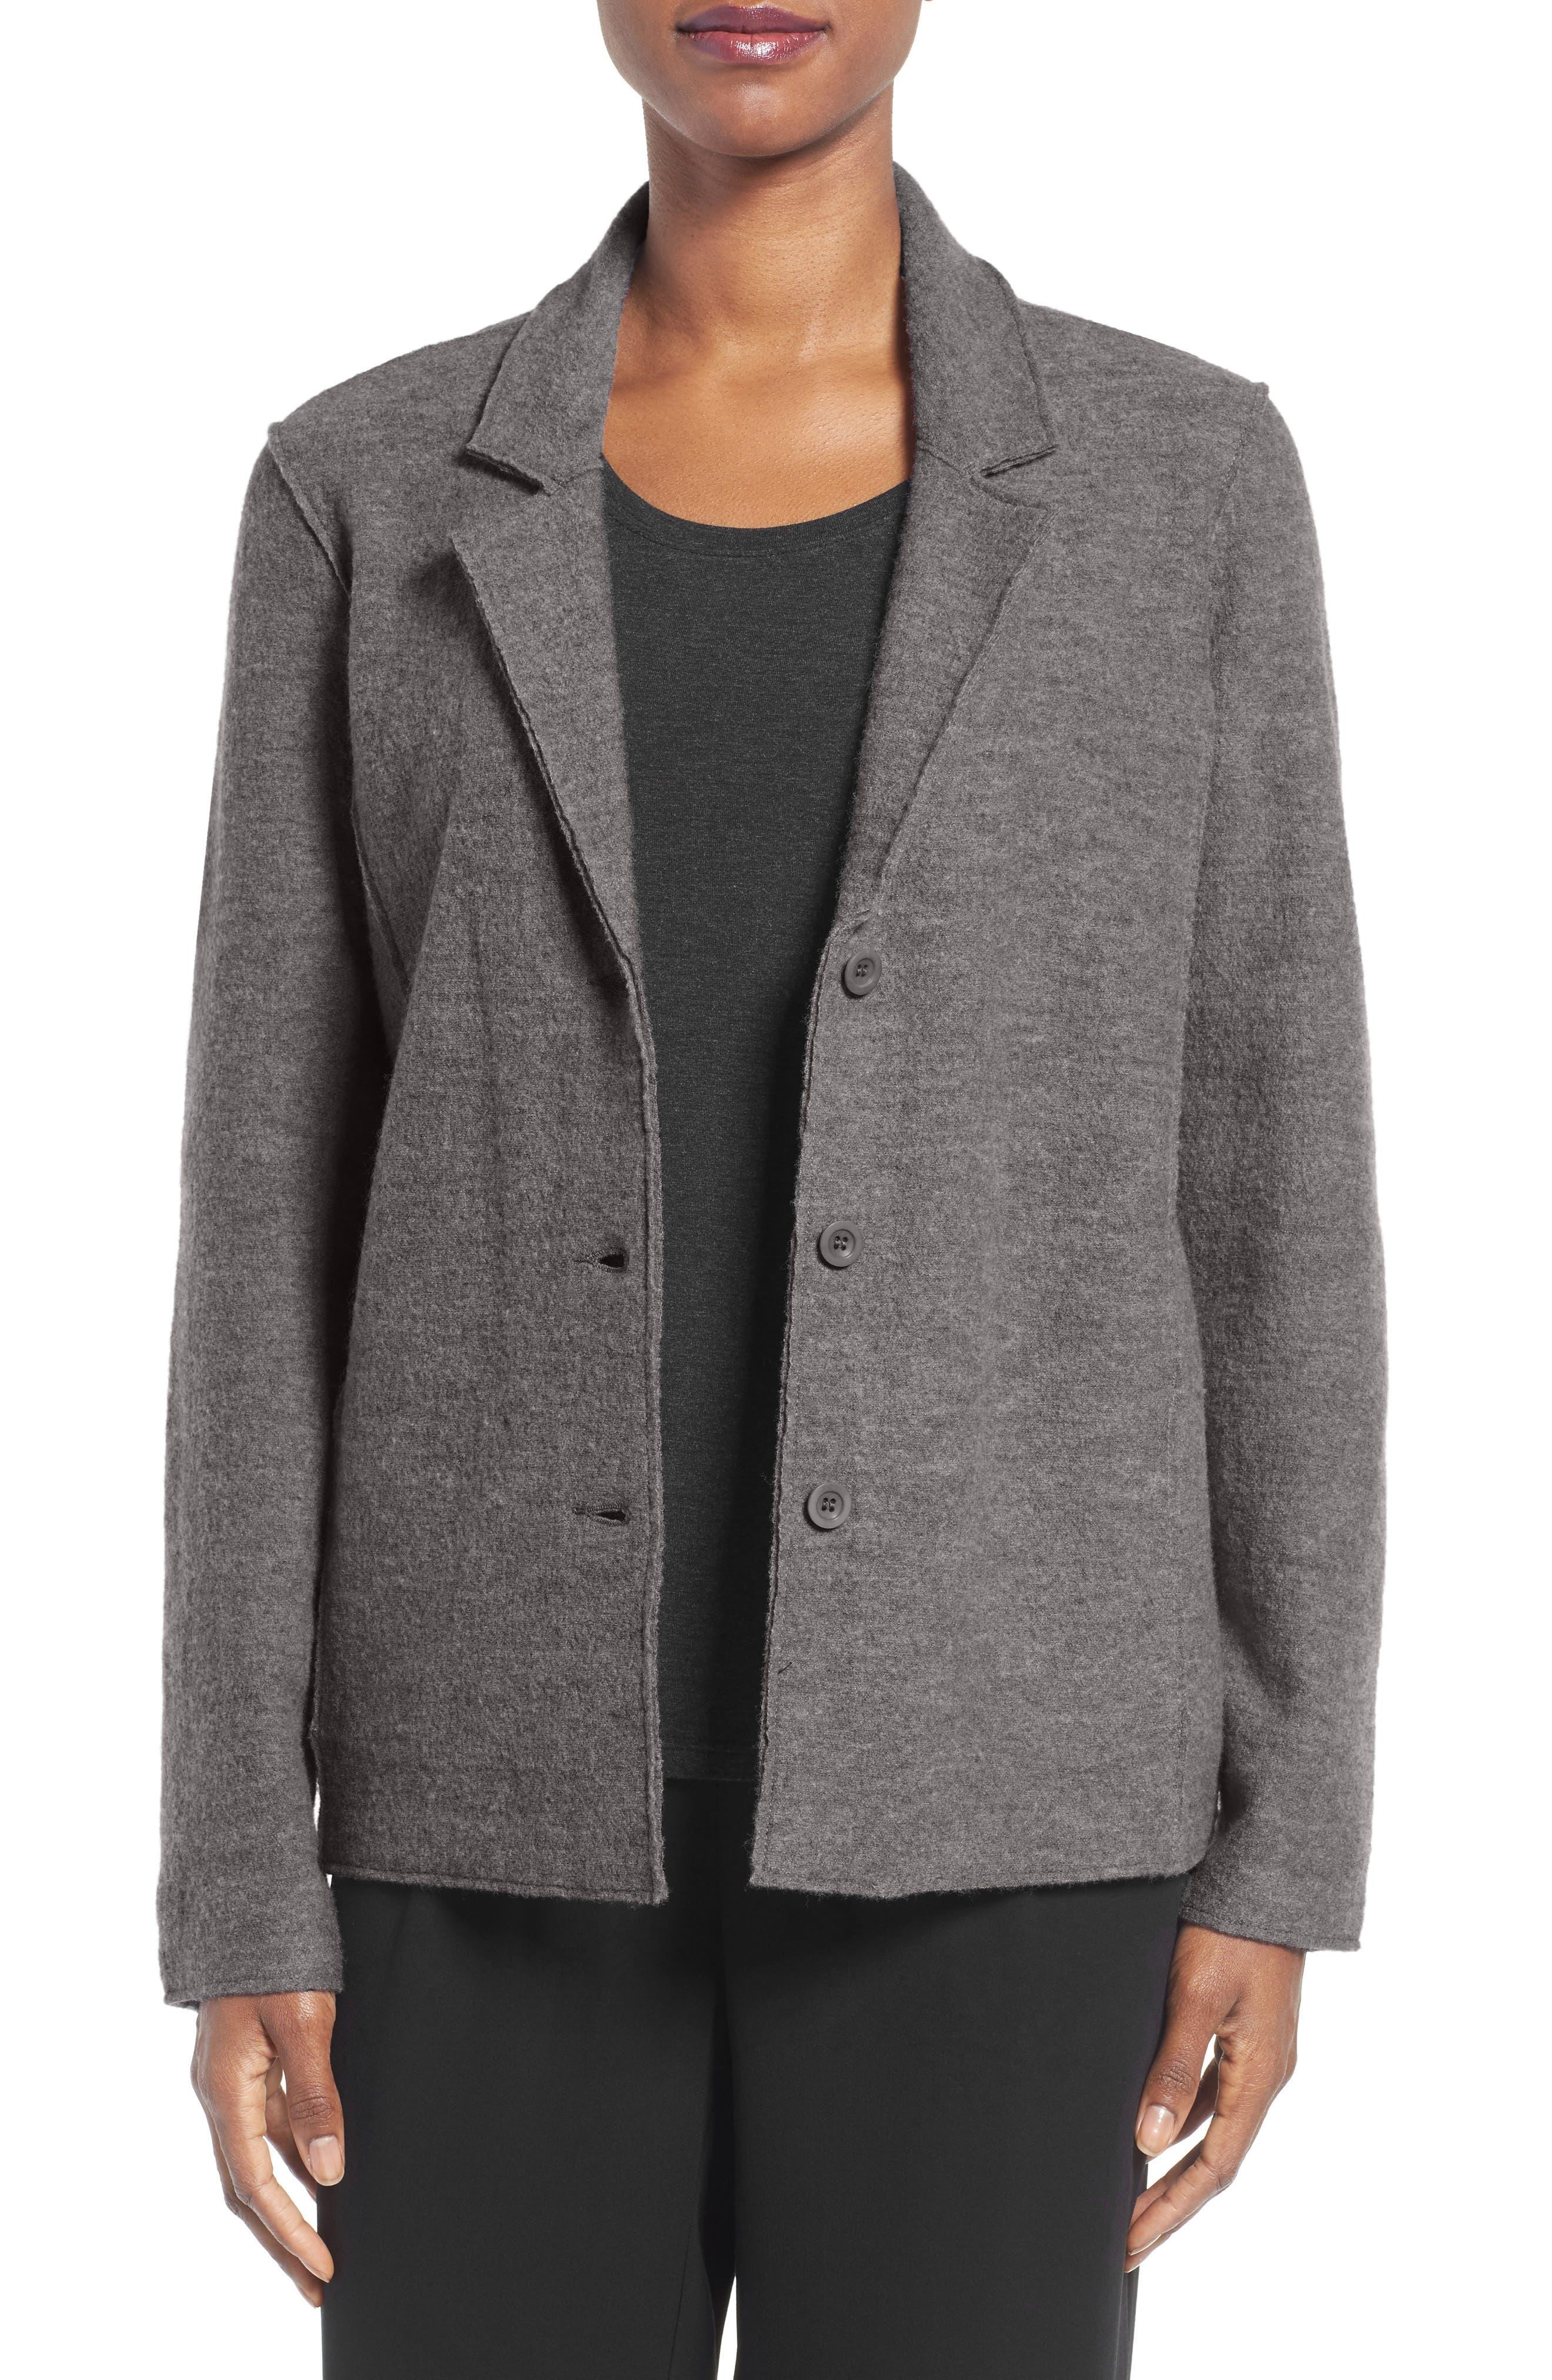 Notch Collar Merino Wool Jacket,                             Main thumbnail 1, color,                             030